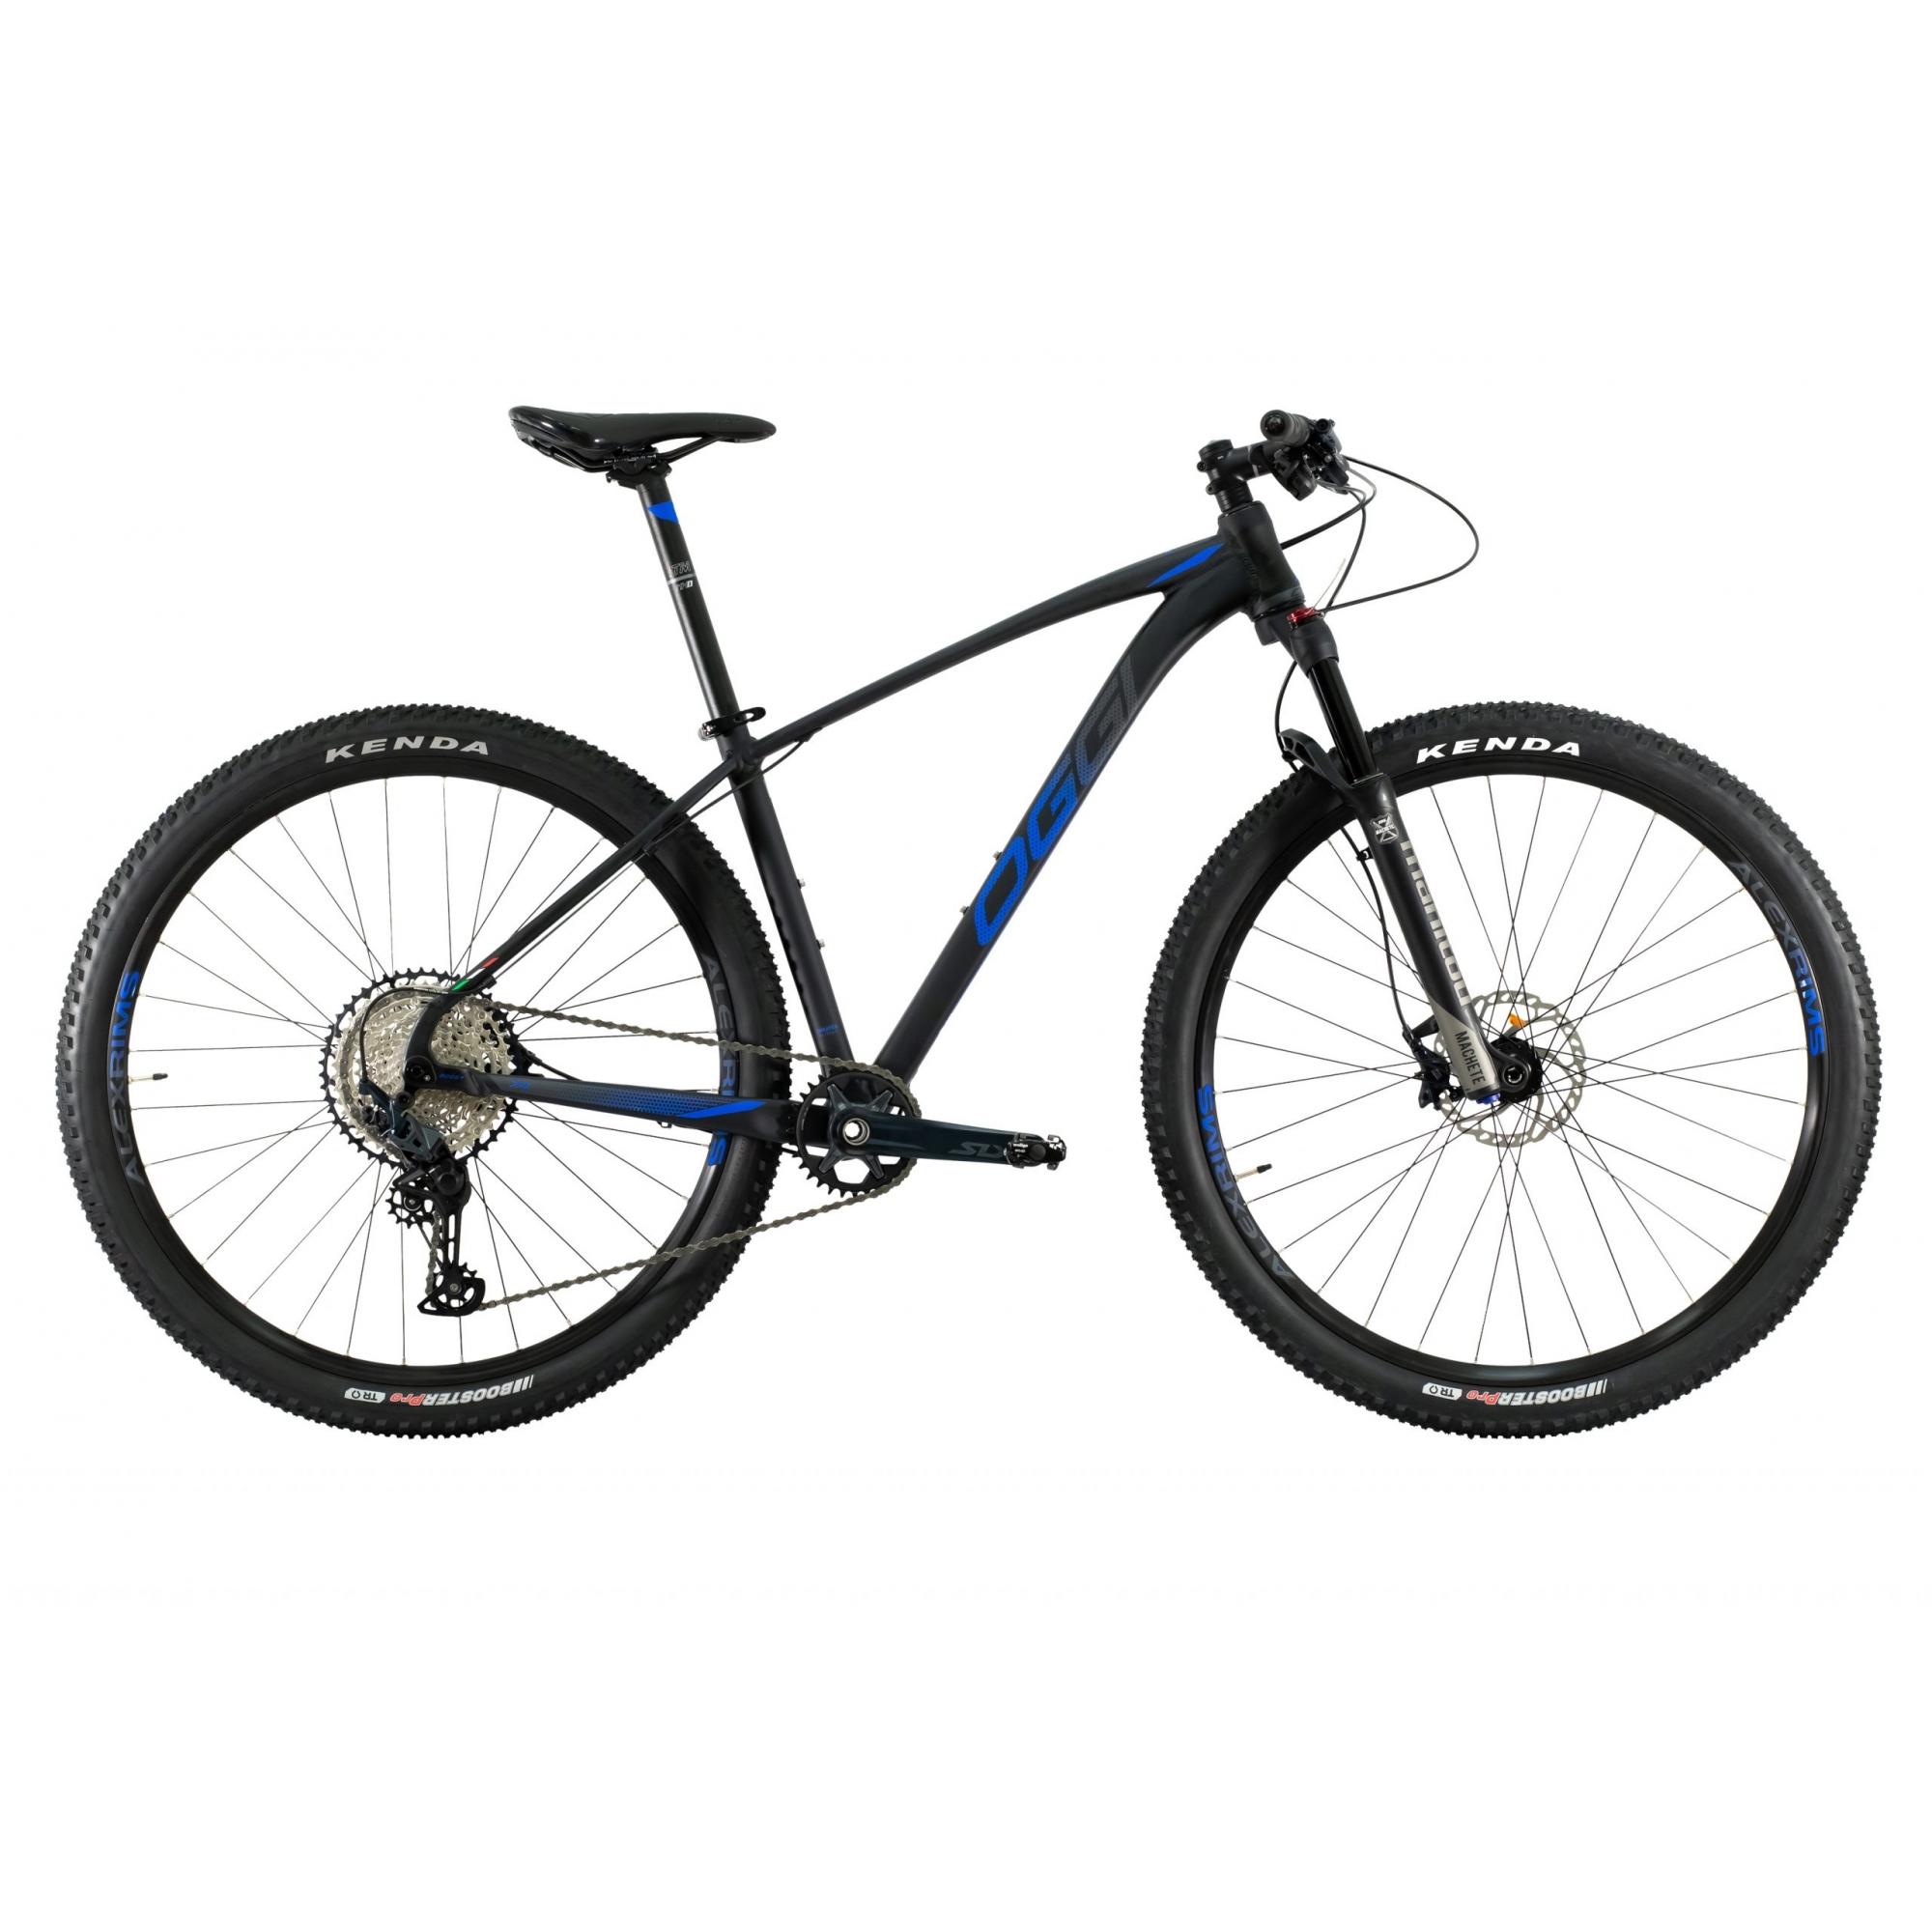 Bicicleta Oggi Big Wheel 7.4 Aro 29 12V - 2021 - Preto e Azul